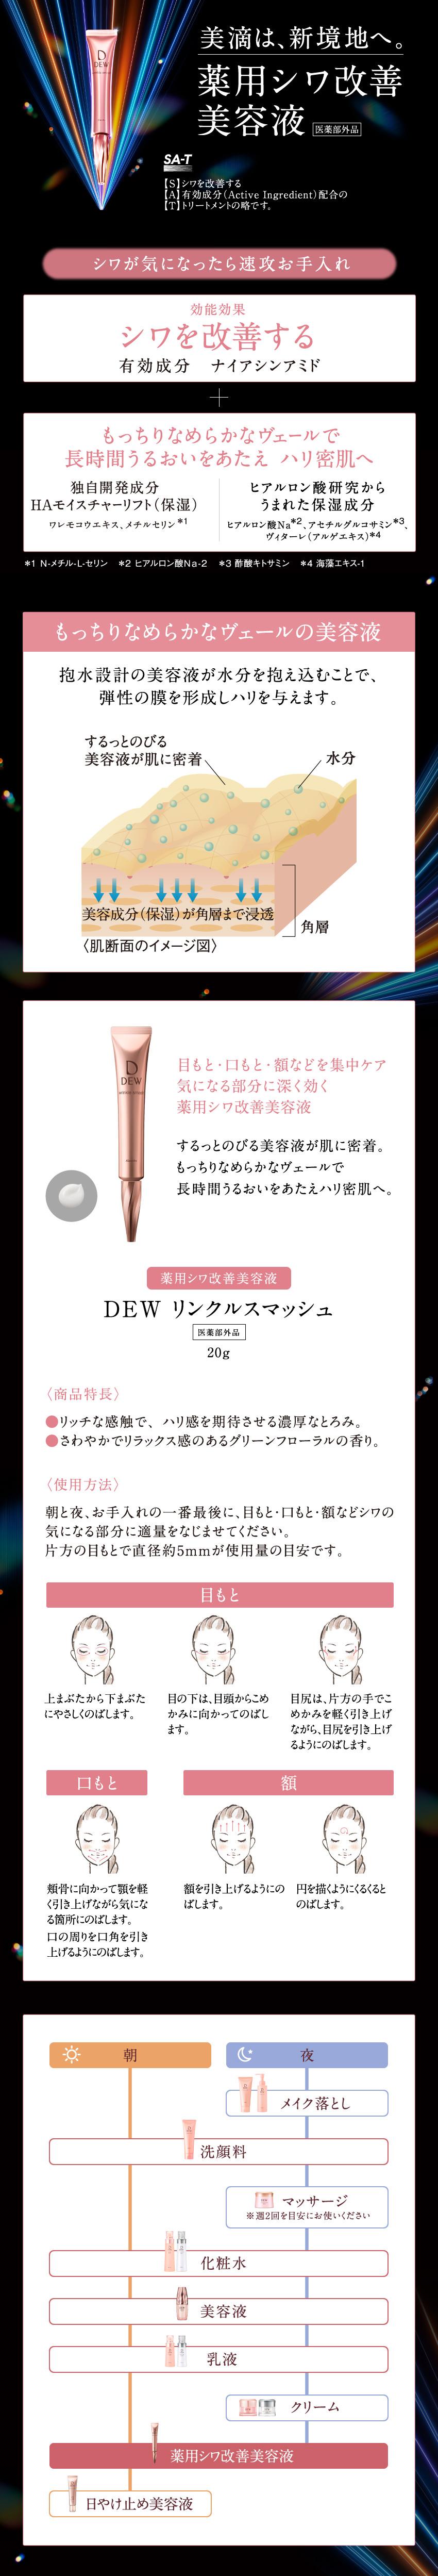 D DEW 美滴は、新境地へ。 薬用シワ改善美容液